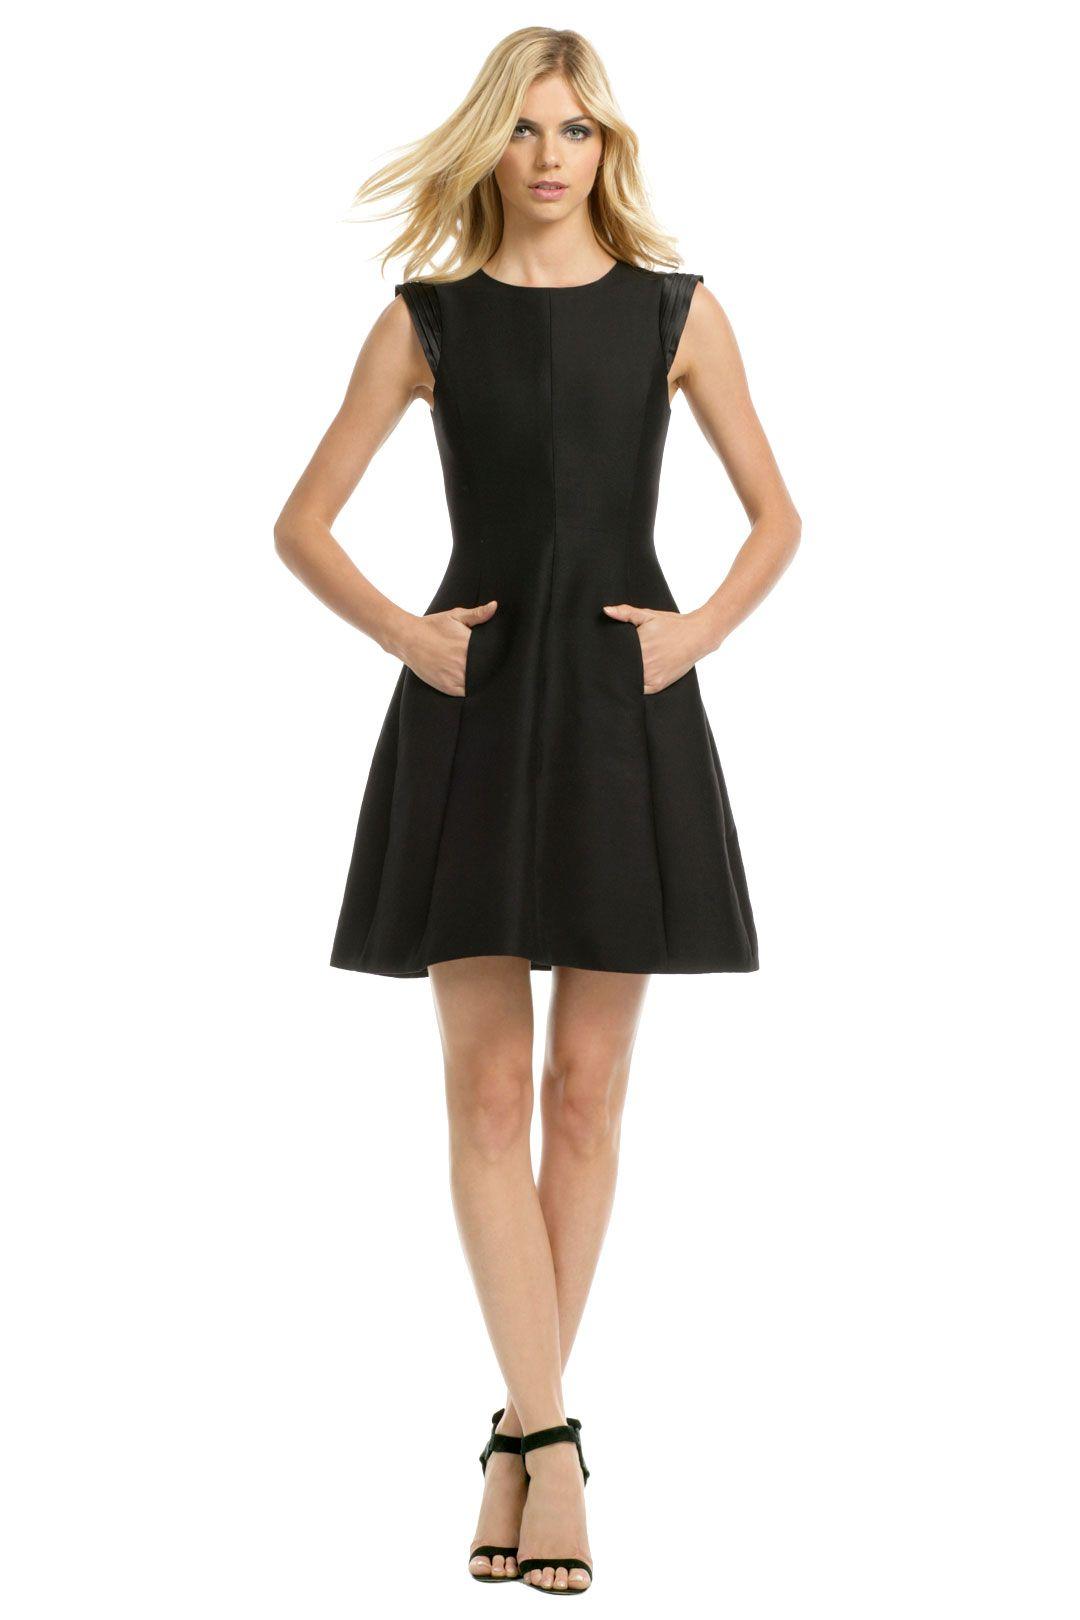 Halston Heritage Night Crawler Dress Dresses Casual Dresses Lil Black Dress [ 1620 x 1080 Pixel ]